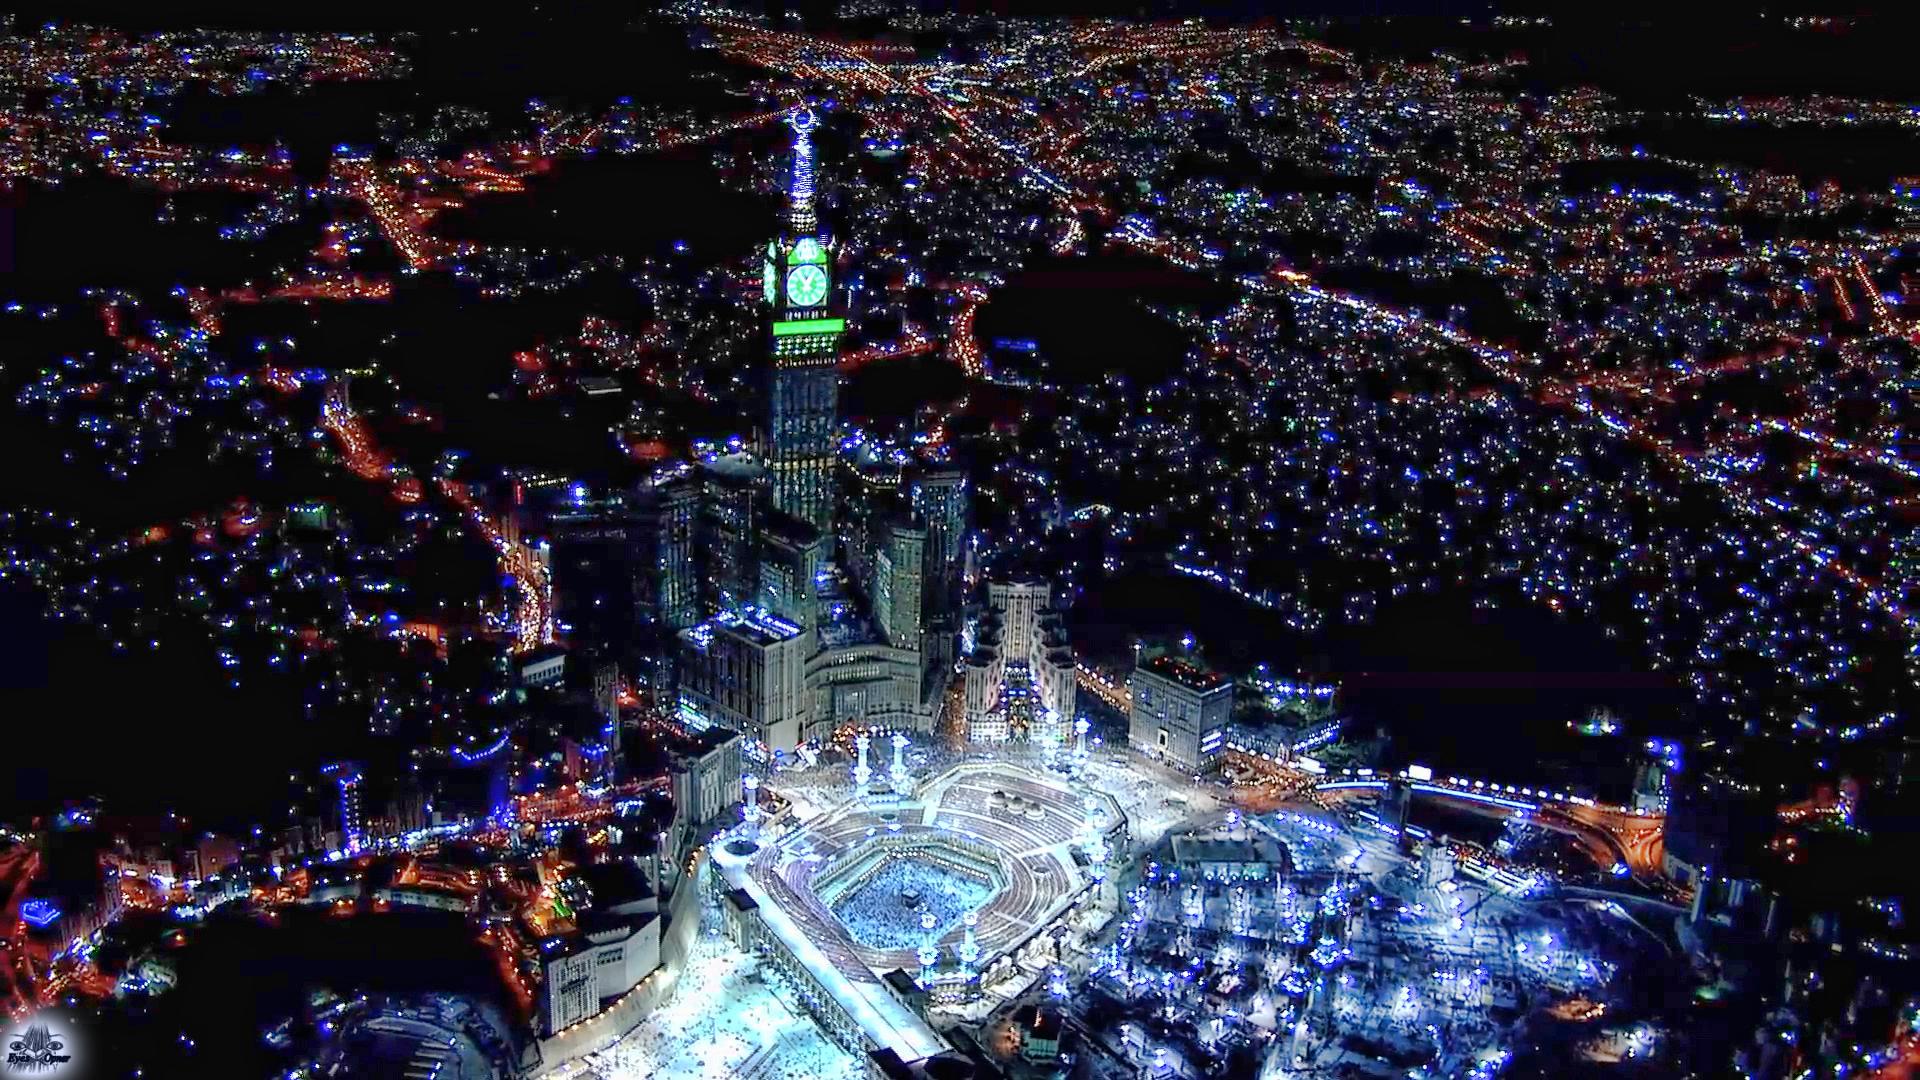 night-beautiful-Mecca-hd-wallpapers